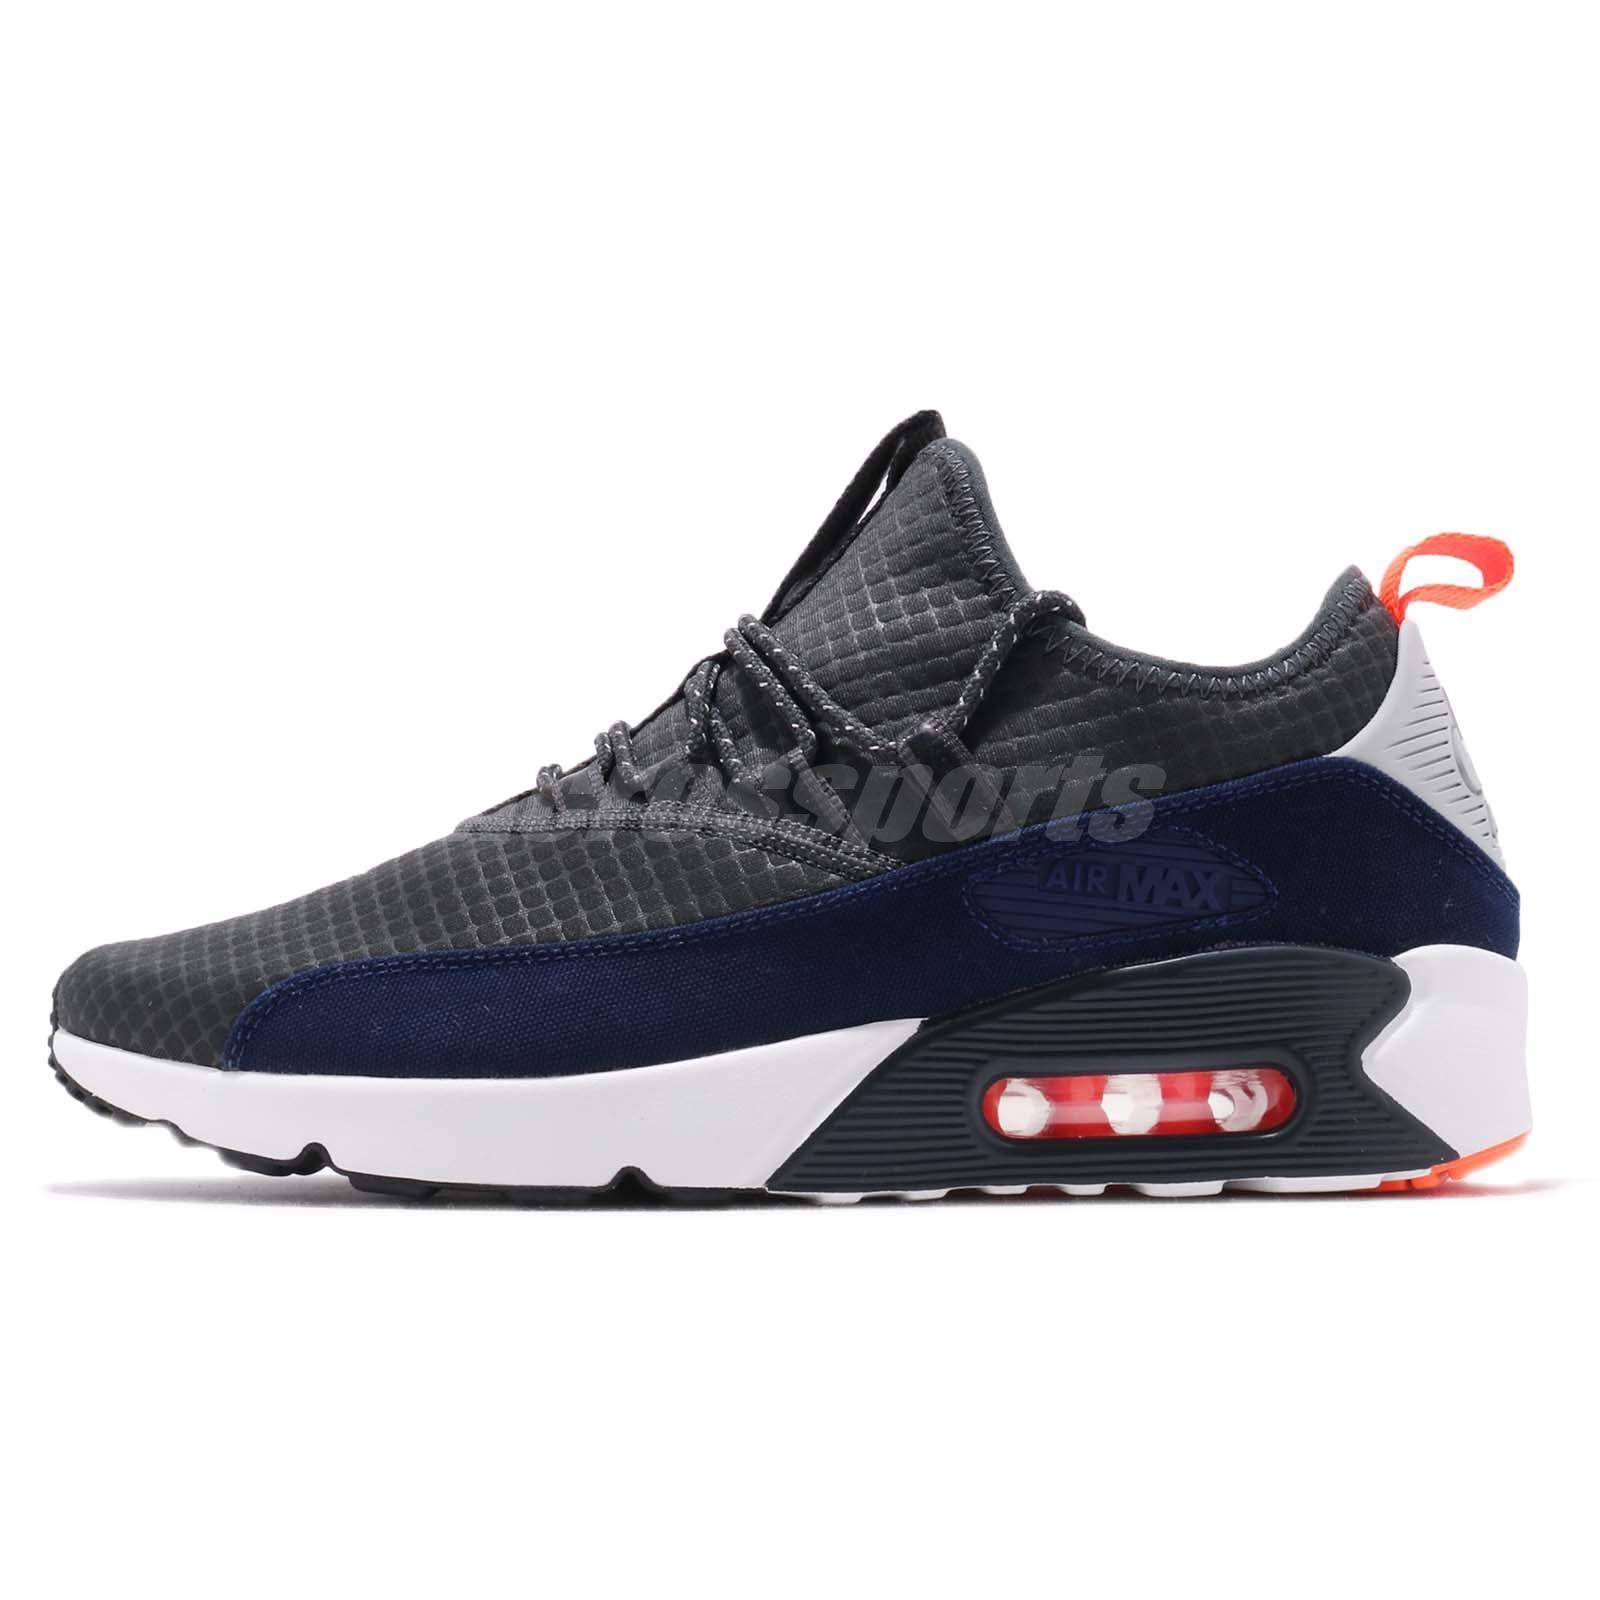 e34d4b882b Nike Air Max 90 EZ Grey Orange Navy White Men Running Shoes Sneakers  AO1745-007